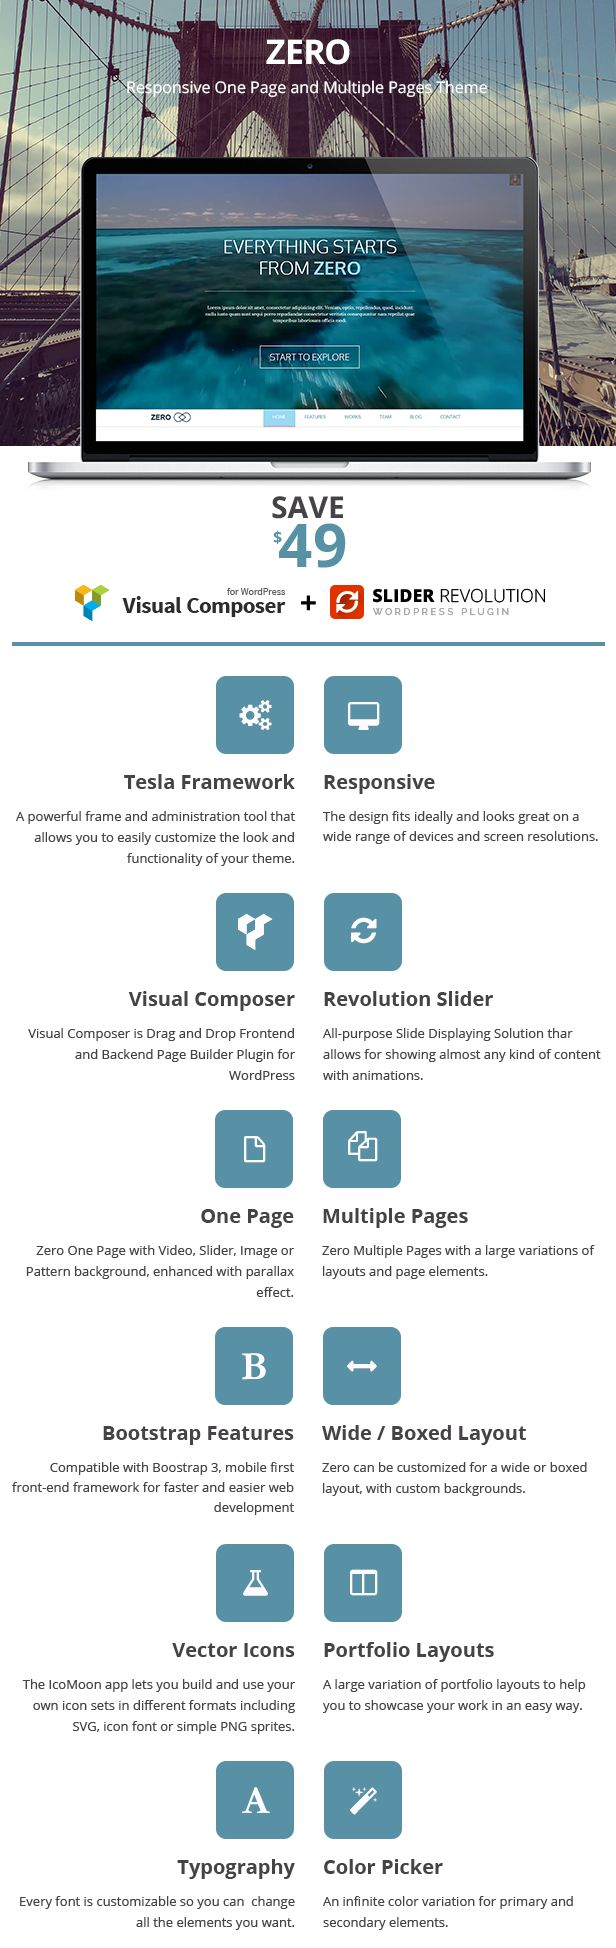 10 best Web Development images on Pinterest   Web development ...